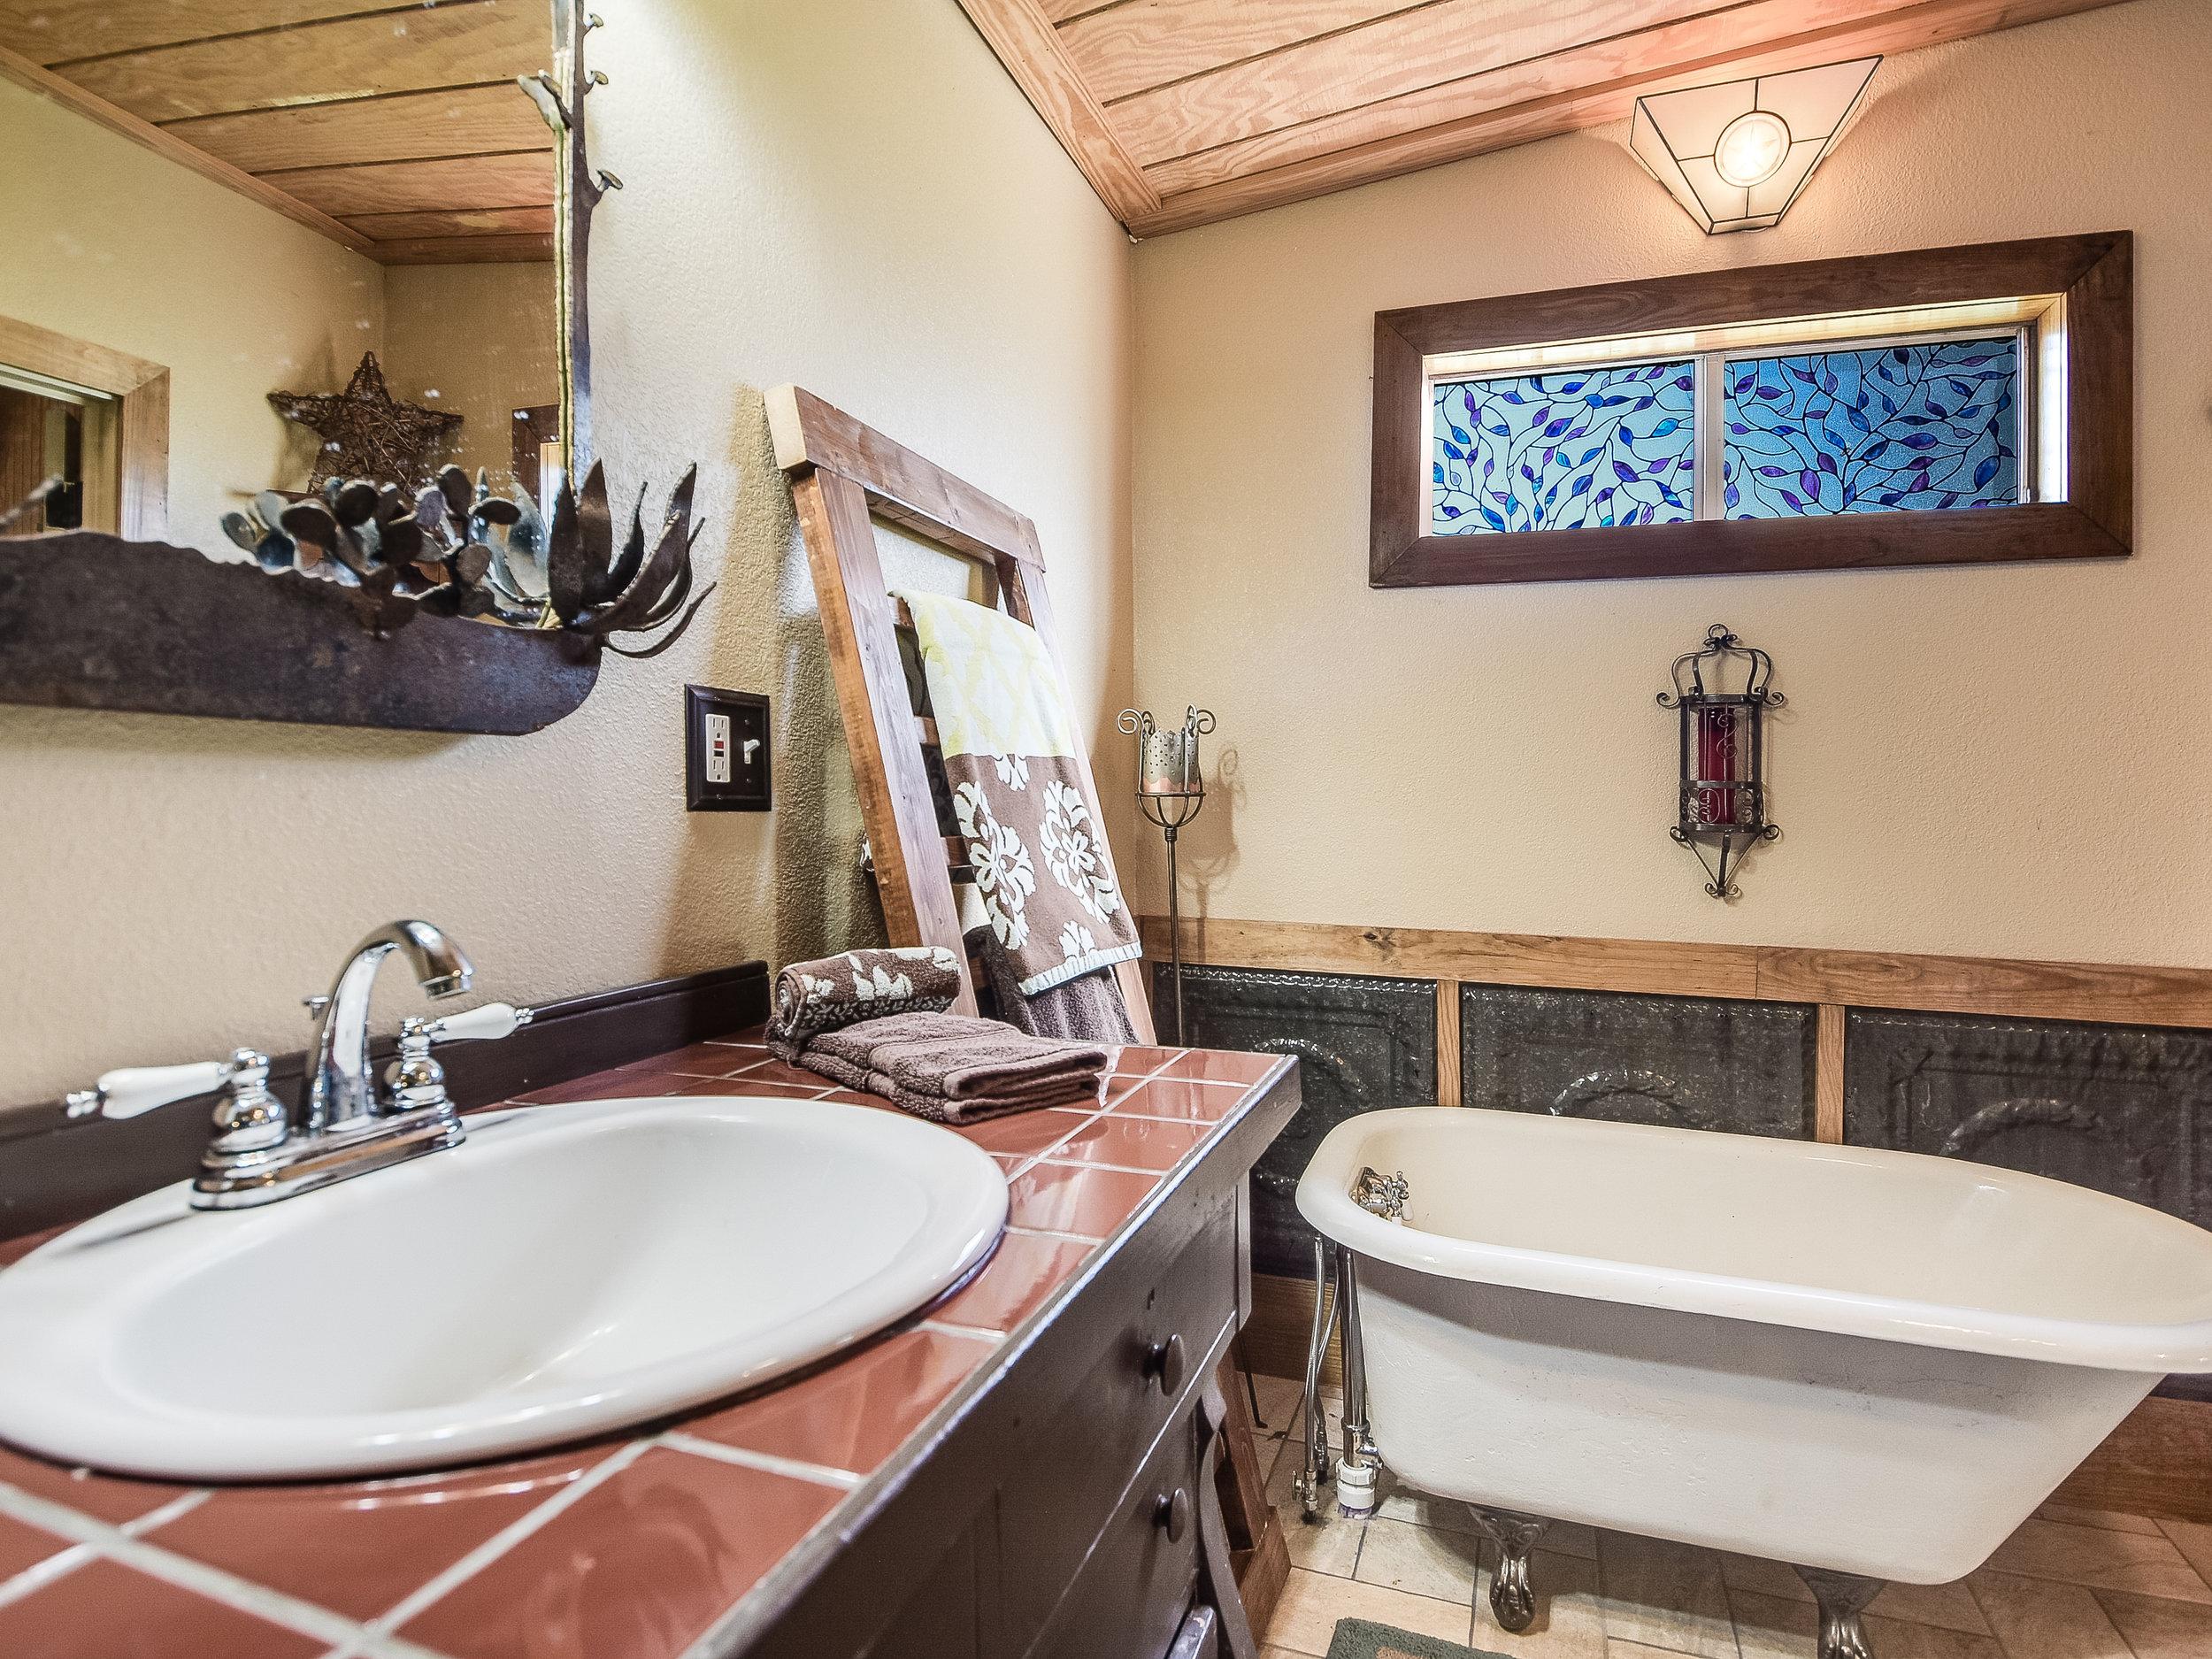 020_House 2 Bath.jpg